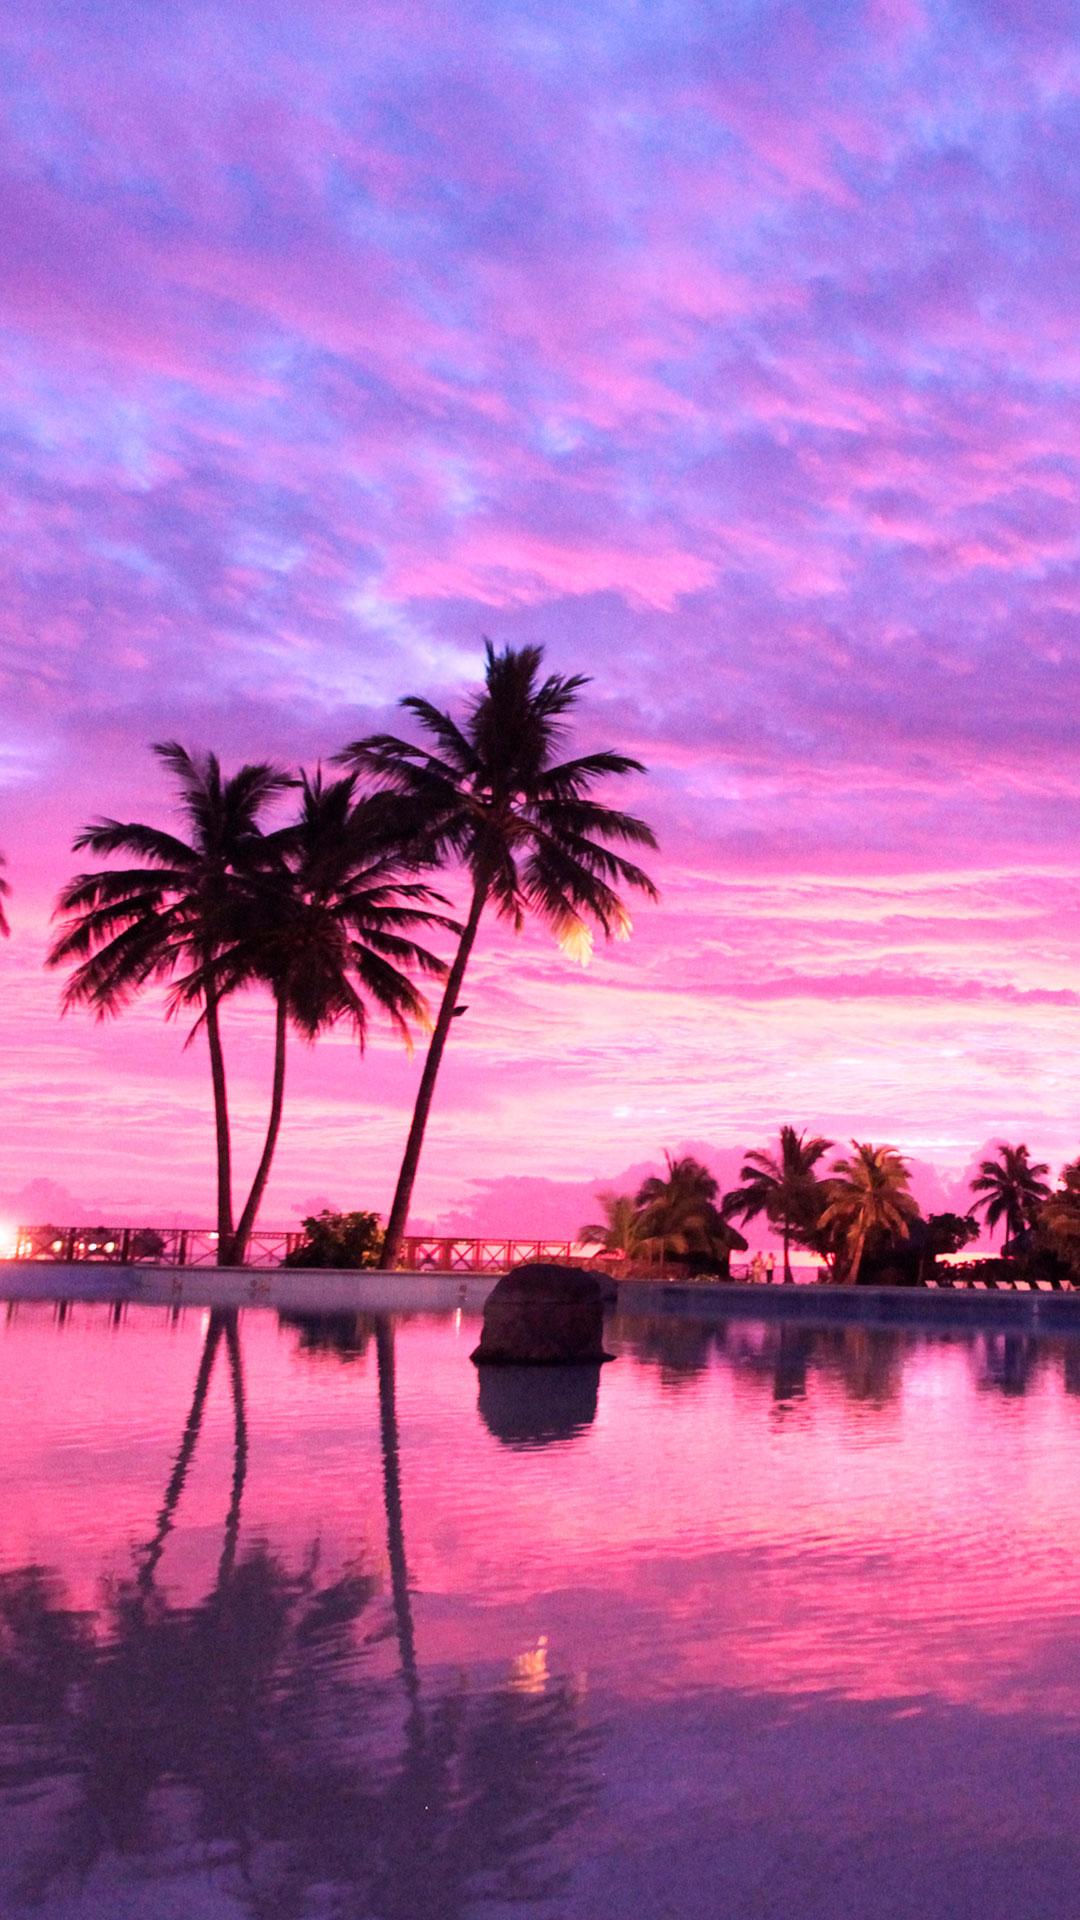 iPhone wallpaper sunset2 Sunset